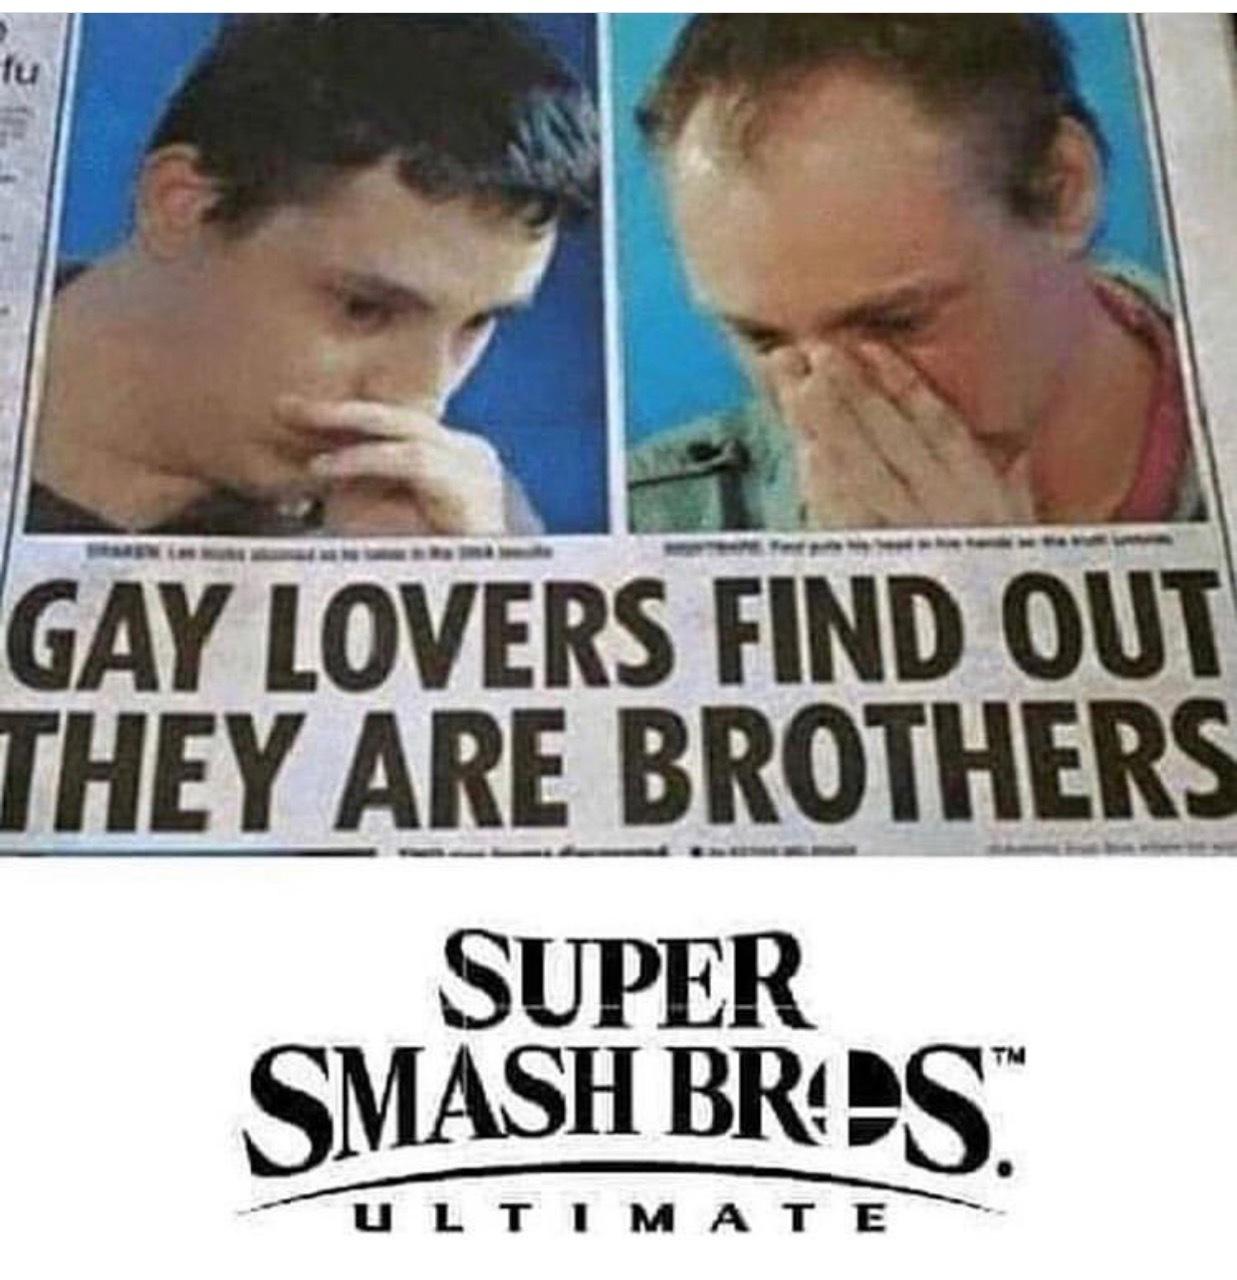 Smash brothers - meme